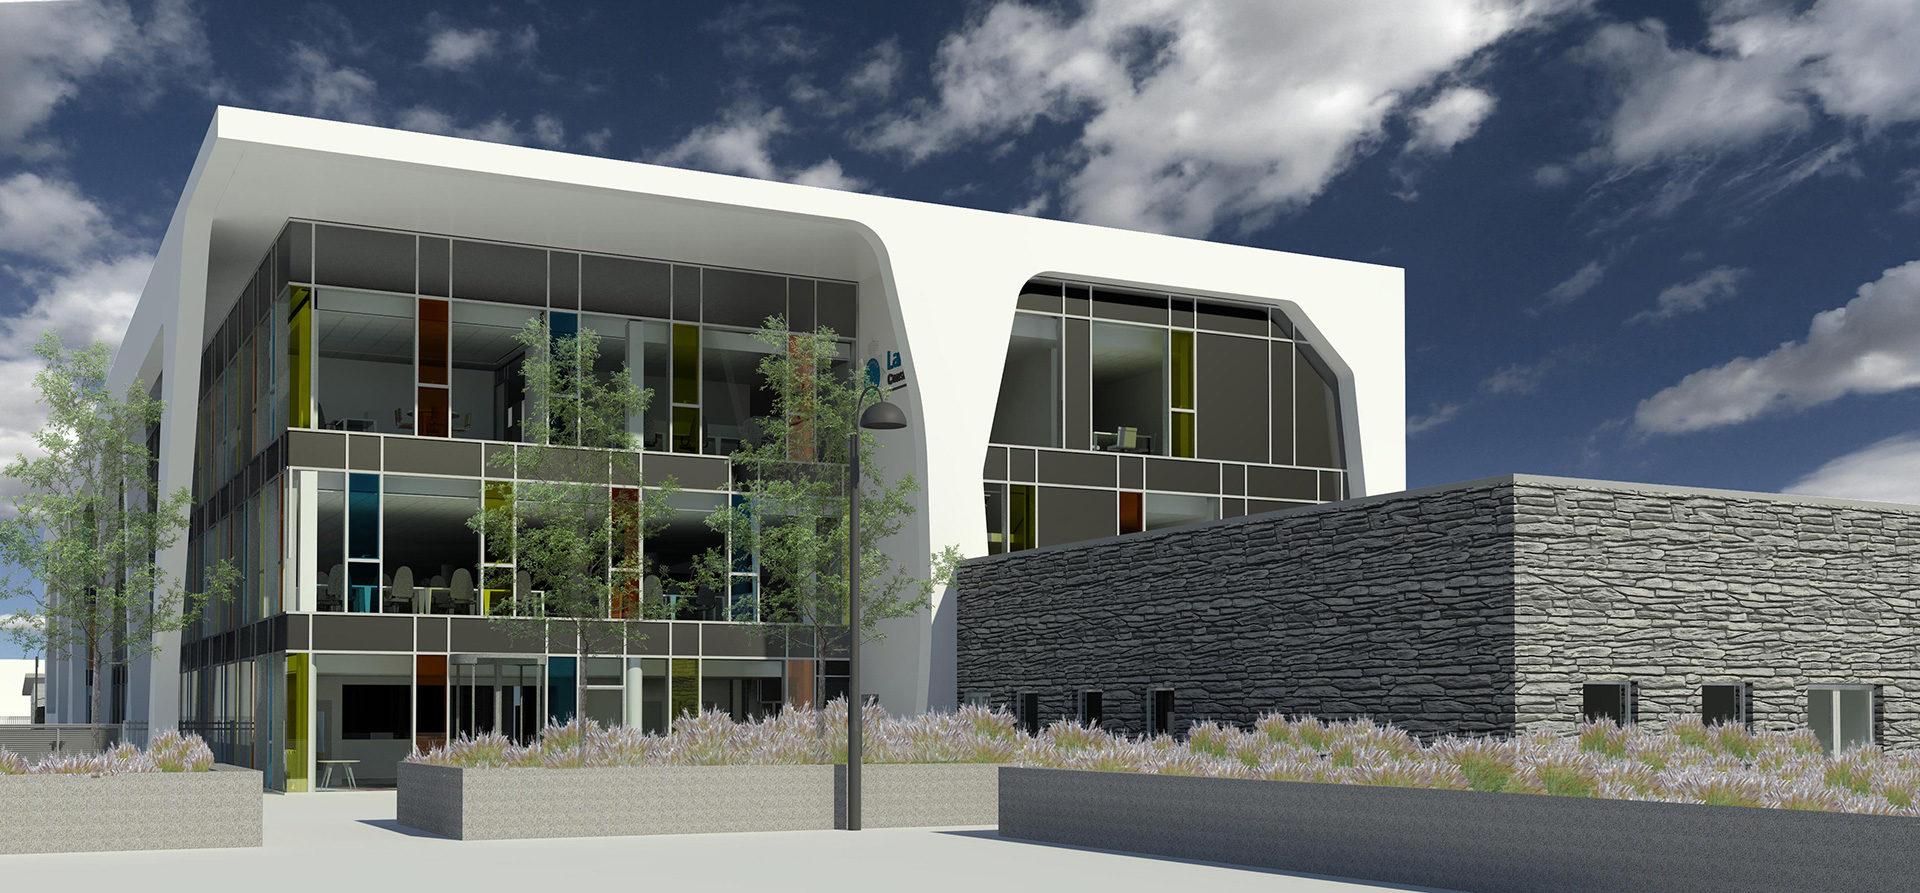 West New Build Image